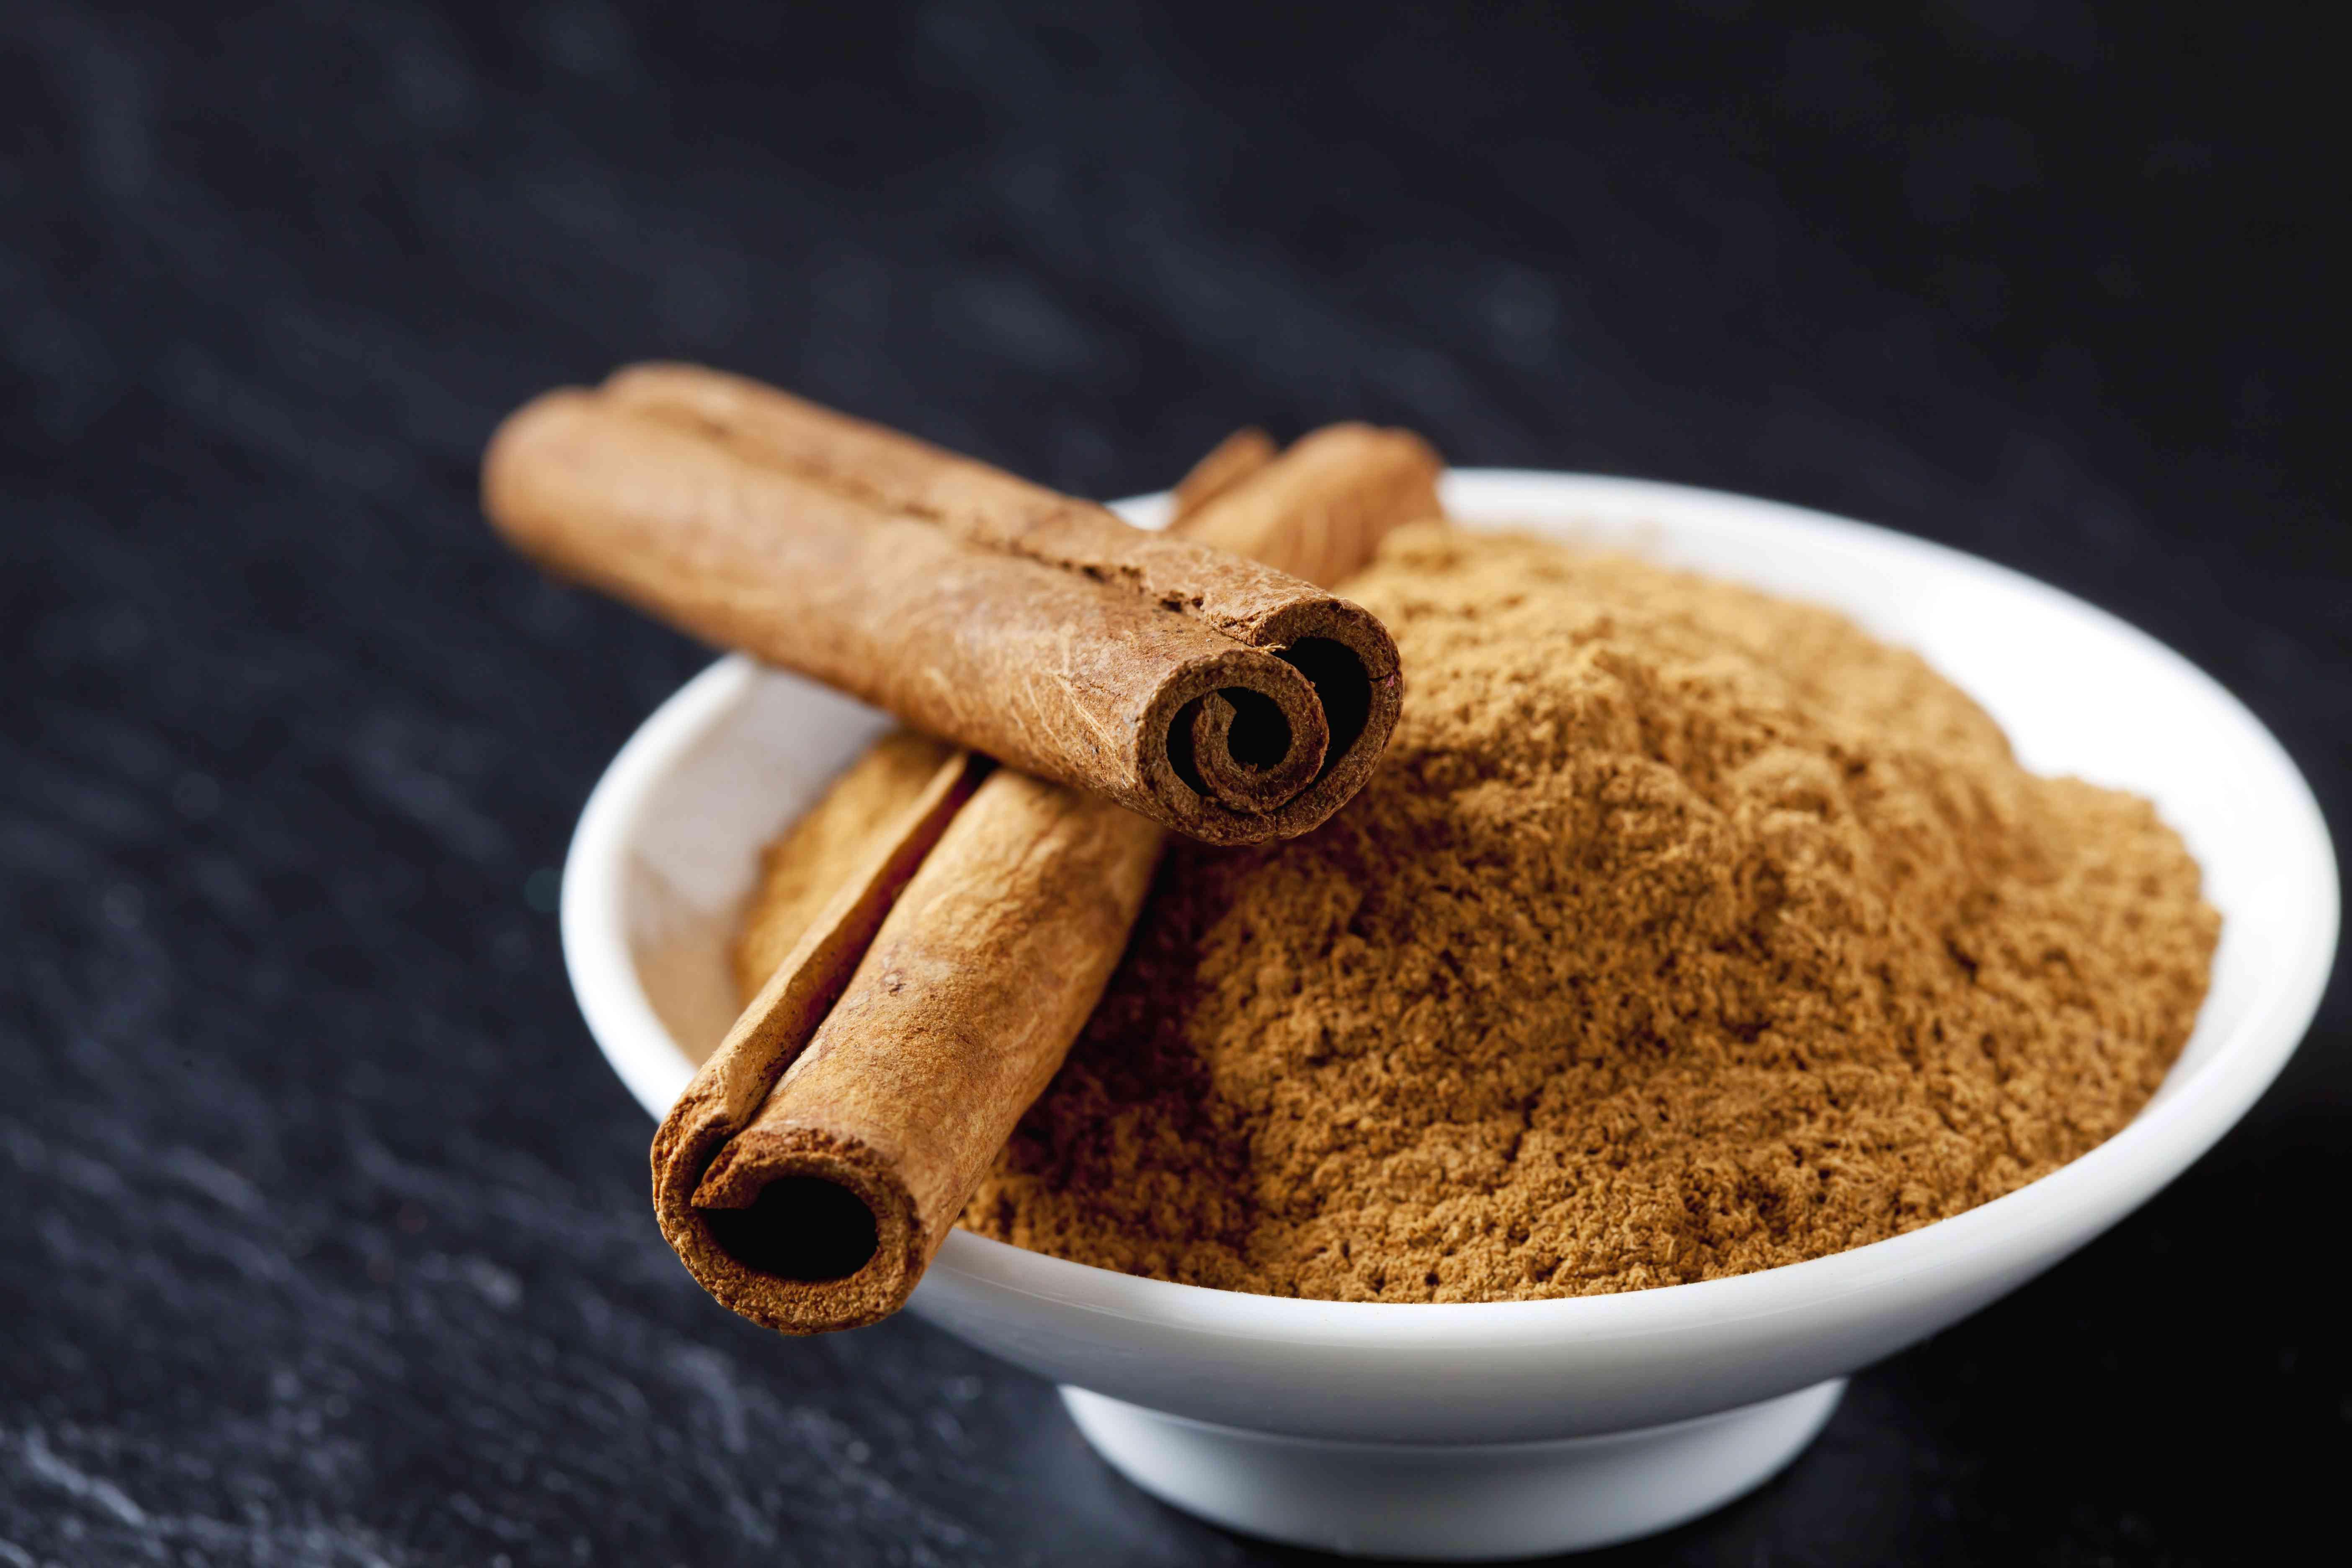 Bowl of cinnamon powder and two cinnamon sticks